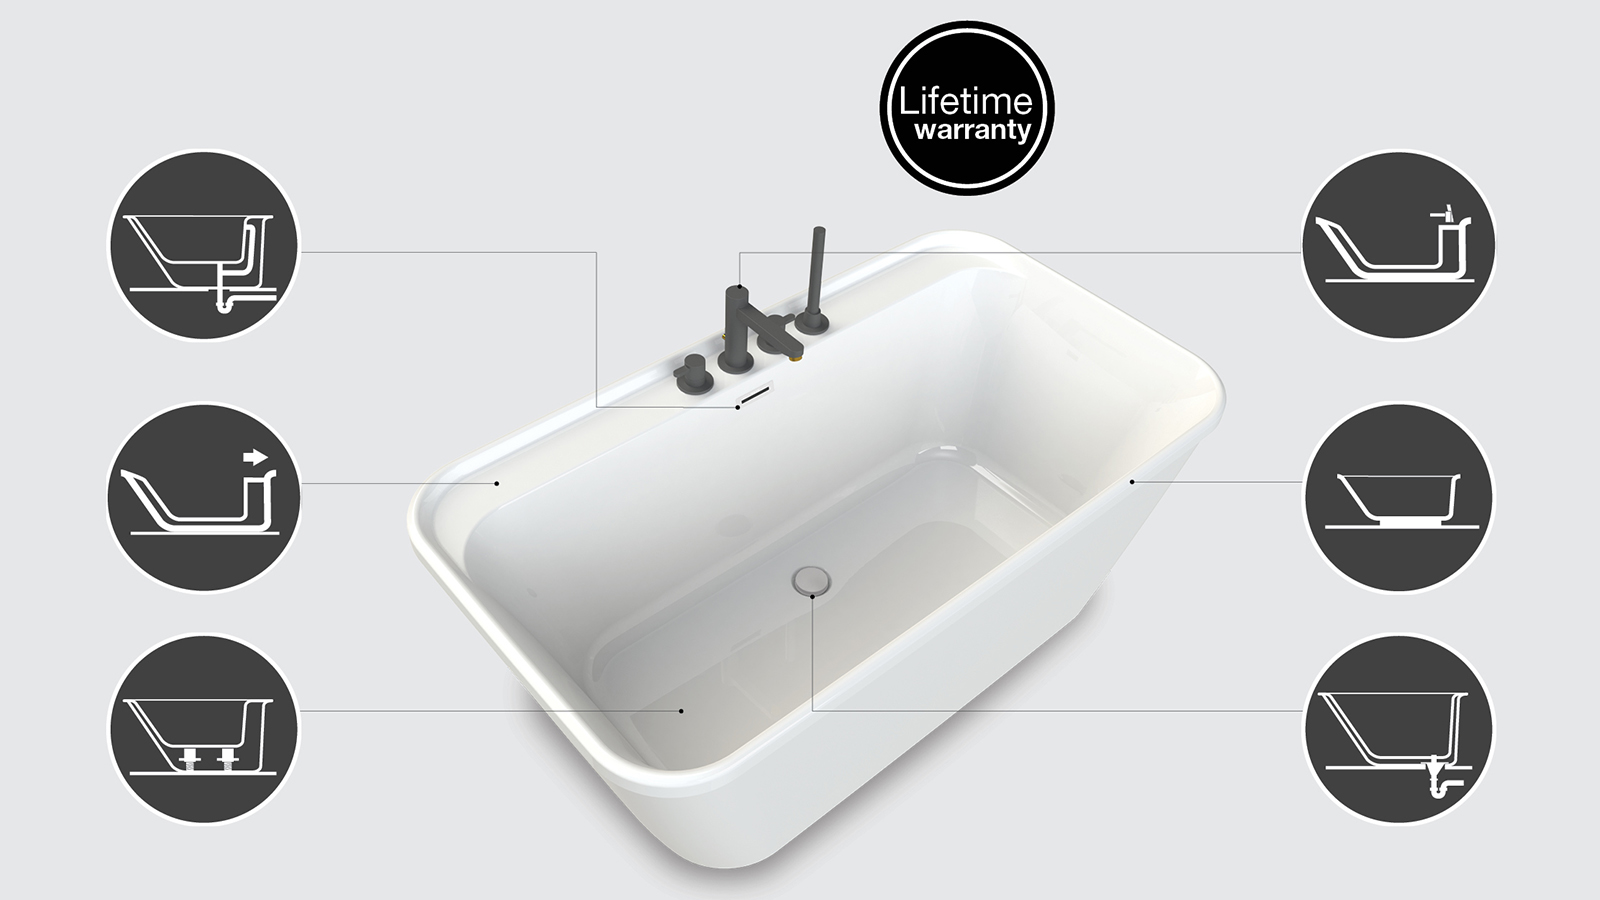 MAAX two piece freestanding bathtub design features